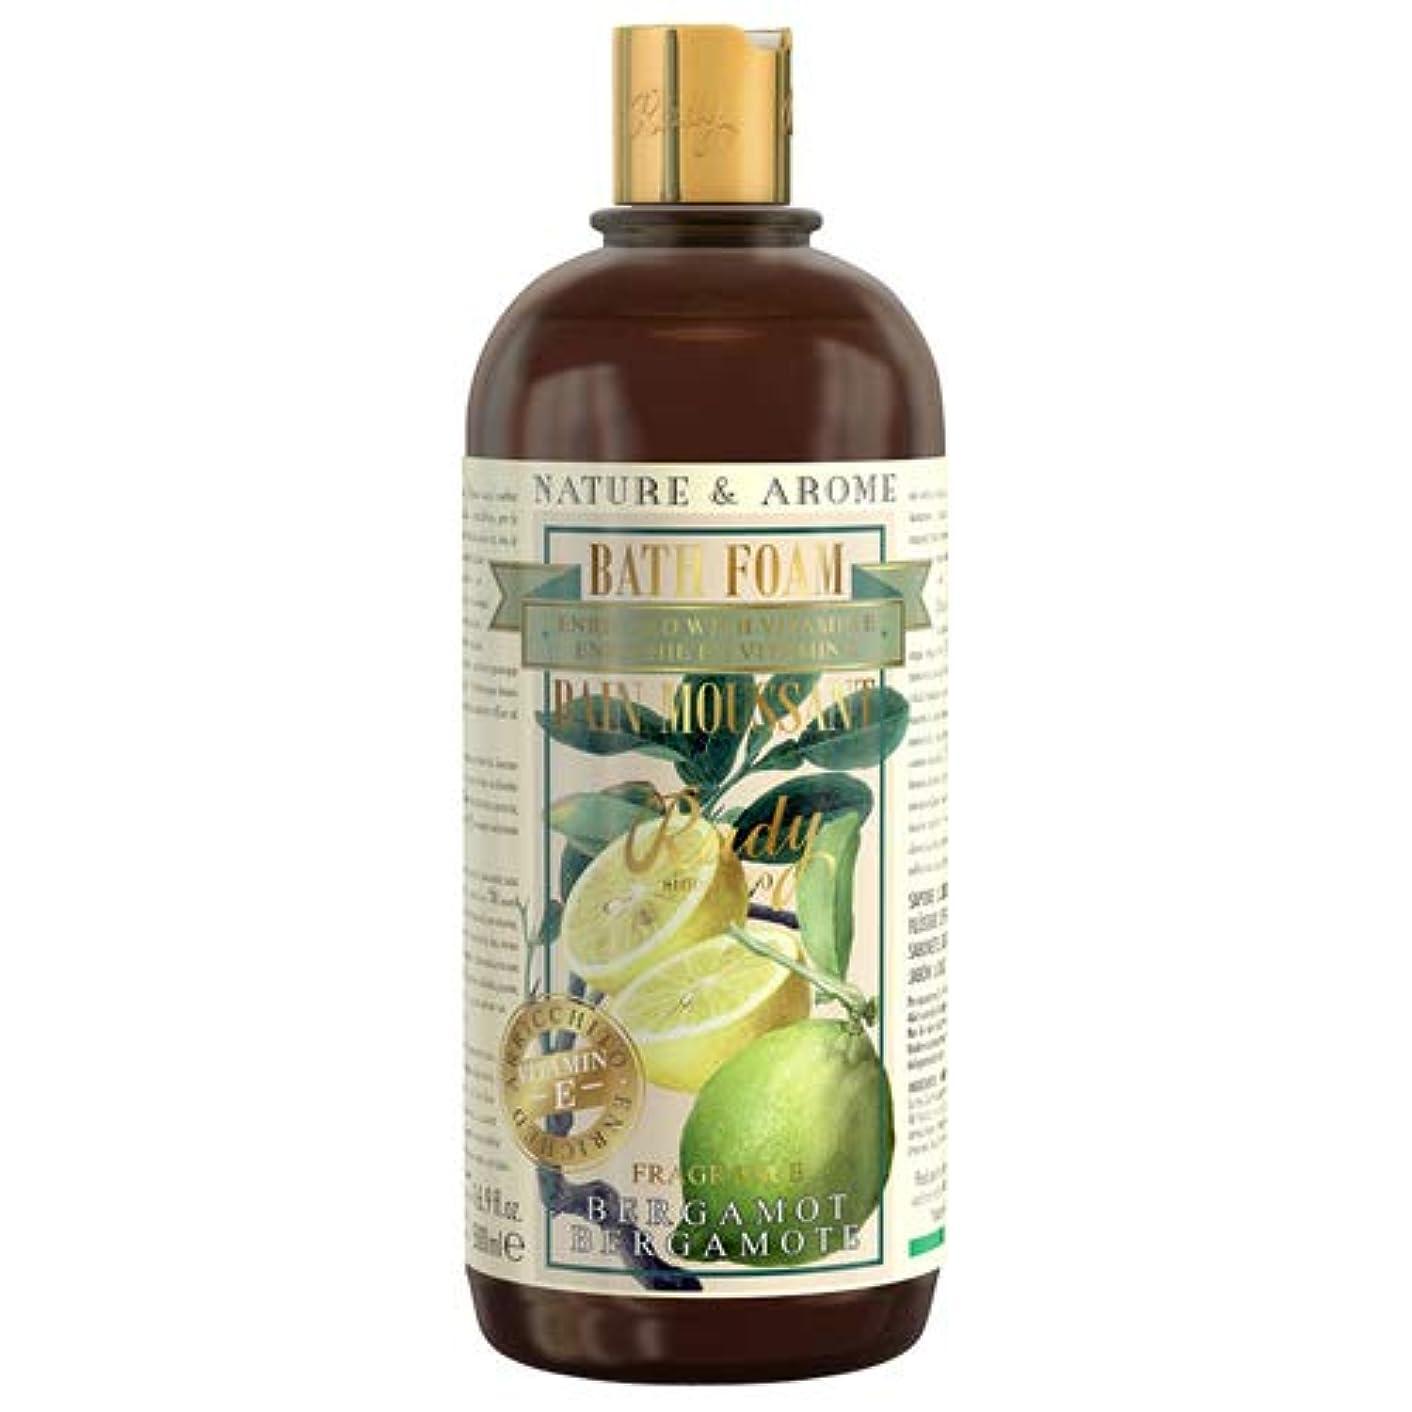 RUDY Nature&Arome Apothecary ネイチャーアロマ アポセカリー Bath & Shower Gel バス&シャワージェル Bergamot ベルガモット